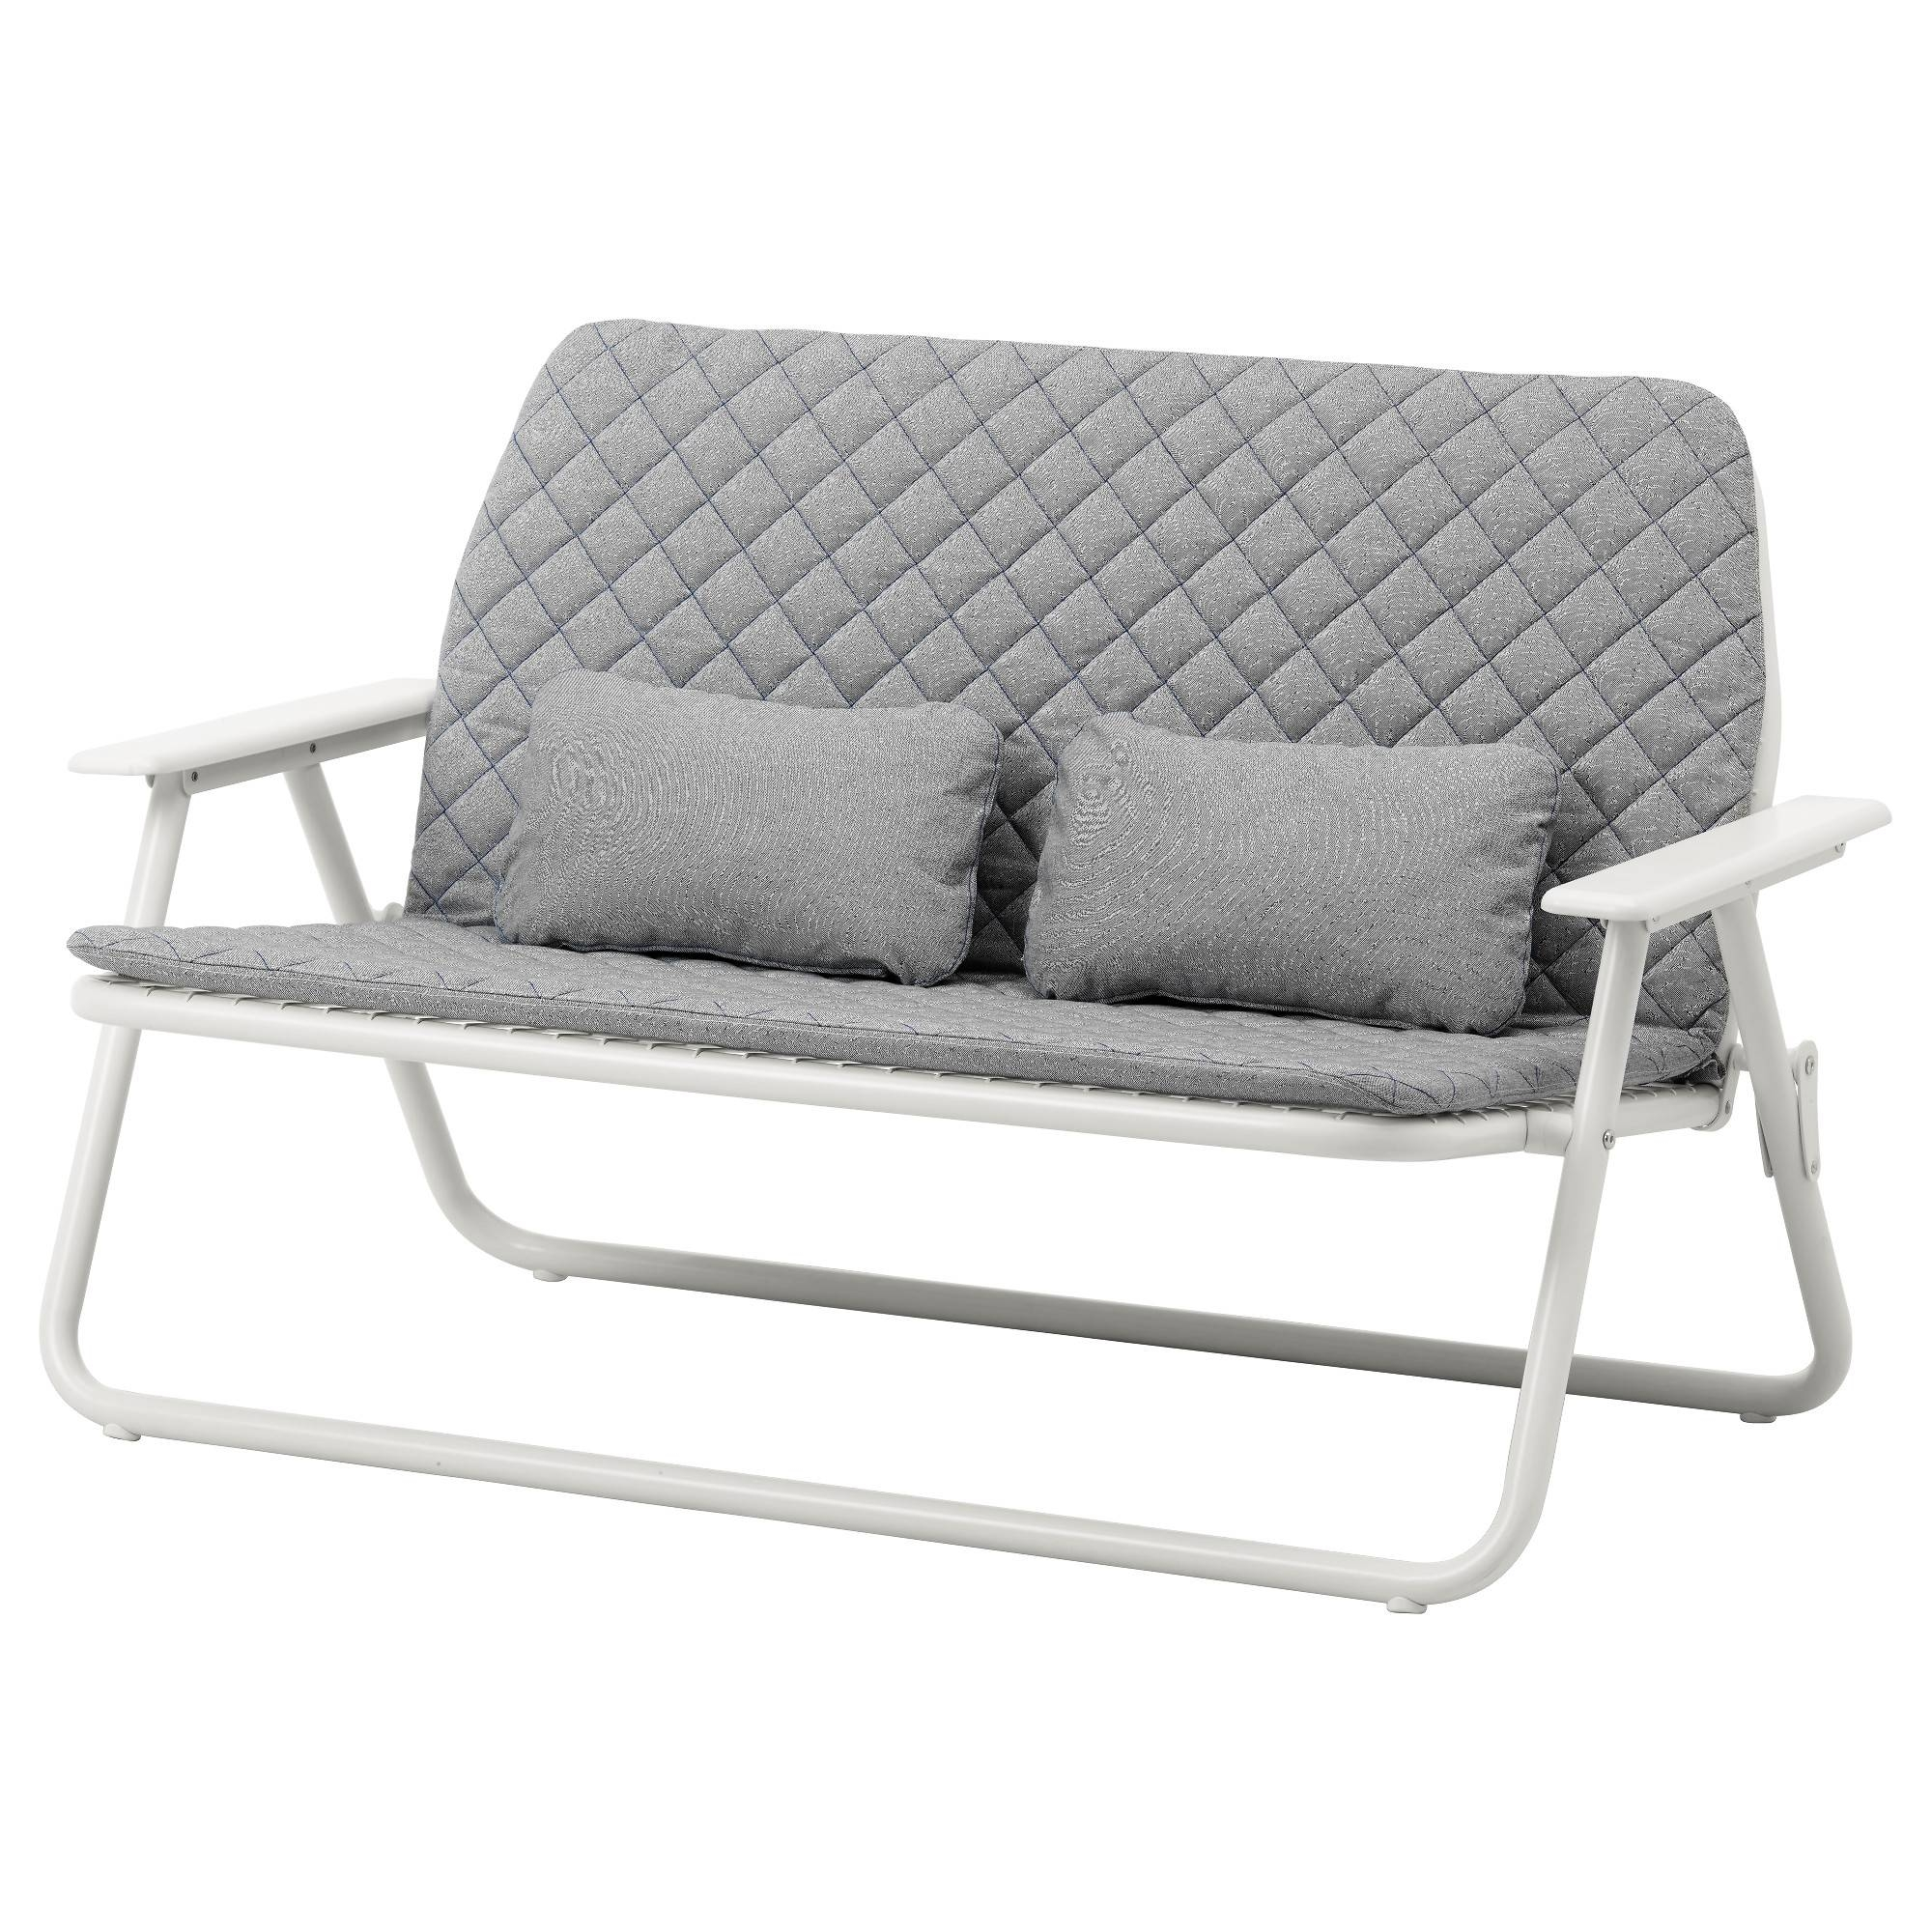 Ikea Ps 2017 2-Seat Sofa Folding - Ikea regarding Fold Up Sofa Chairs (Image 12 of 15)